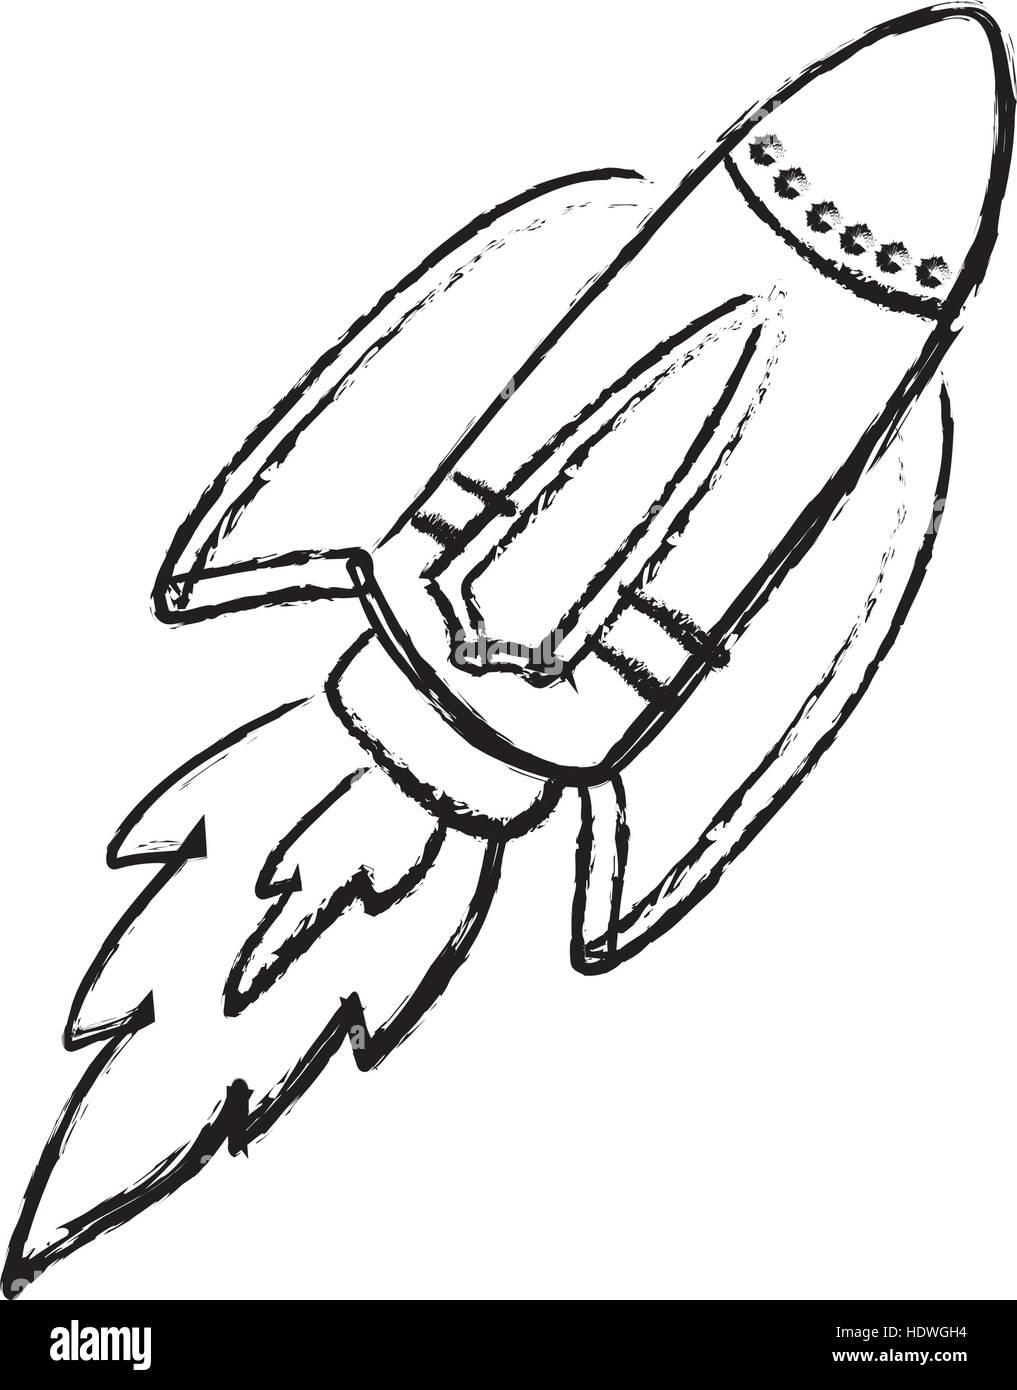 Uncategorized Draw Rocket rocket spaceship draw icon vector illustration graphic design design